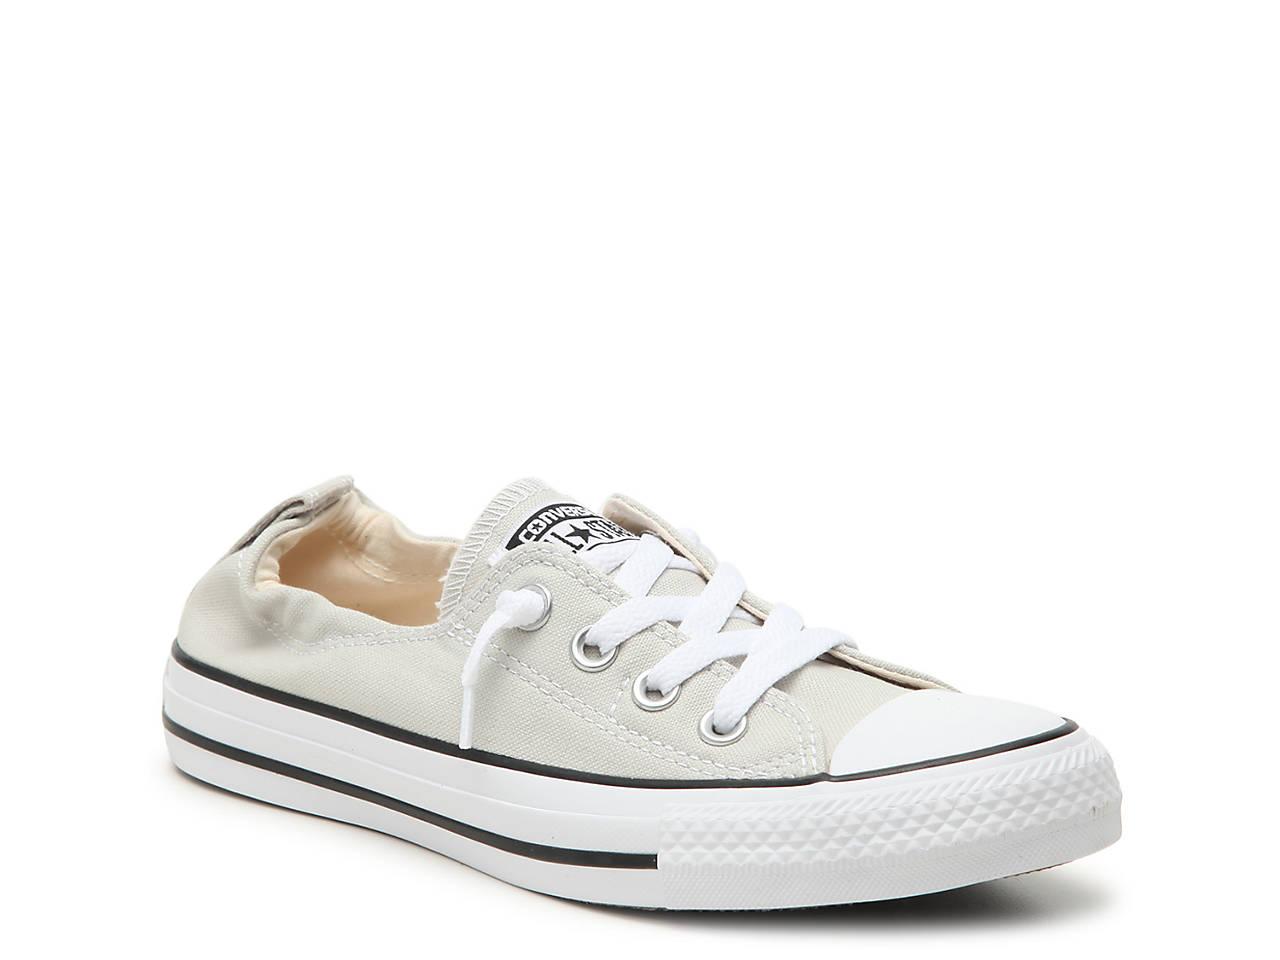 Converse Chuck Taylor All Star Shoreline Slip Sneakers (Women) R8MQa